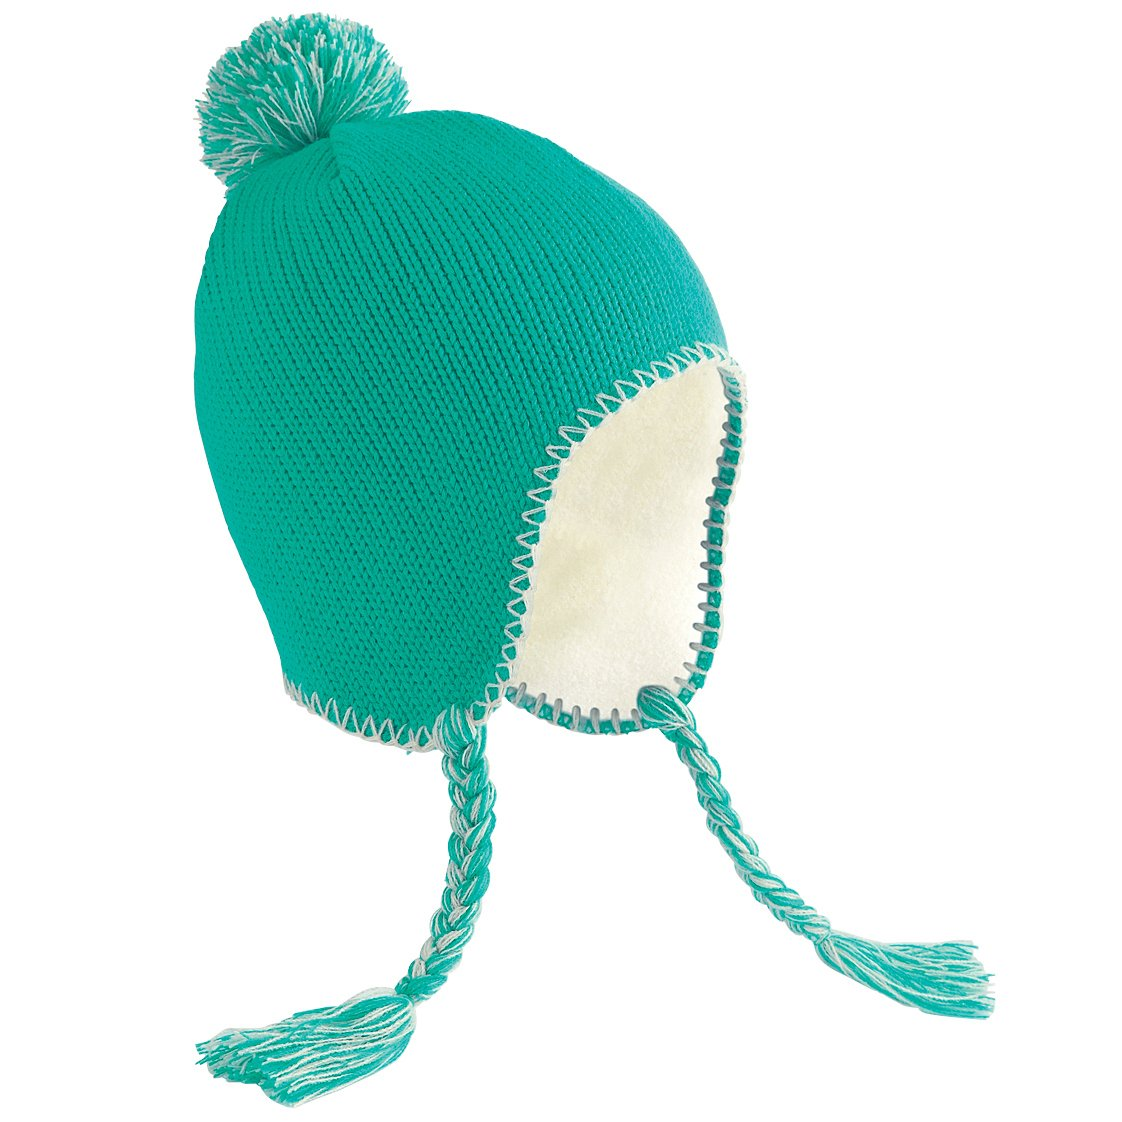 Beechfield Unisex Classic Tassel Peru Winter Hat UTRW249_4